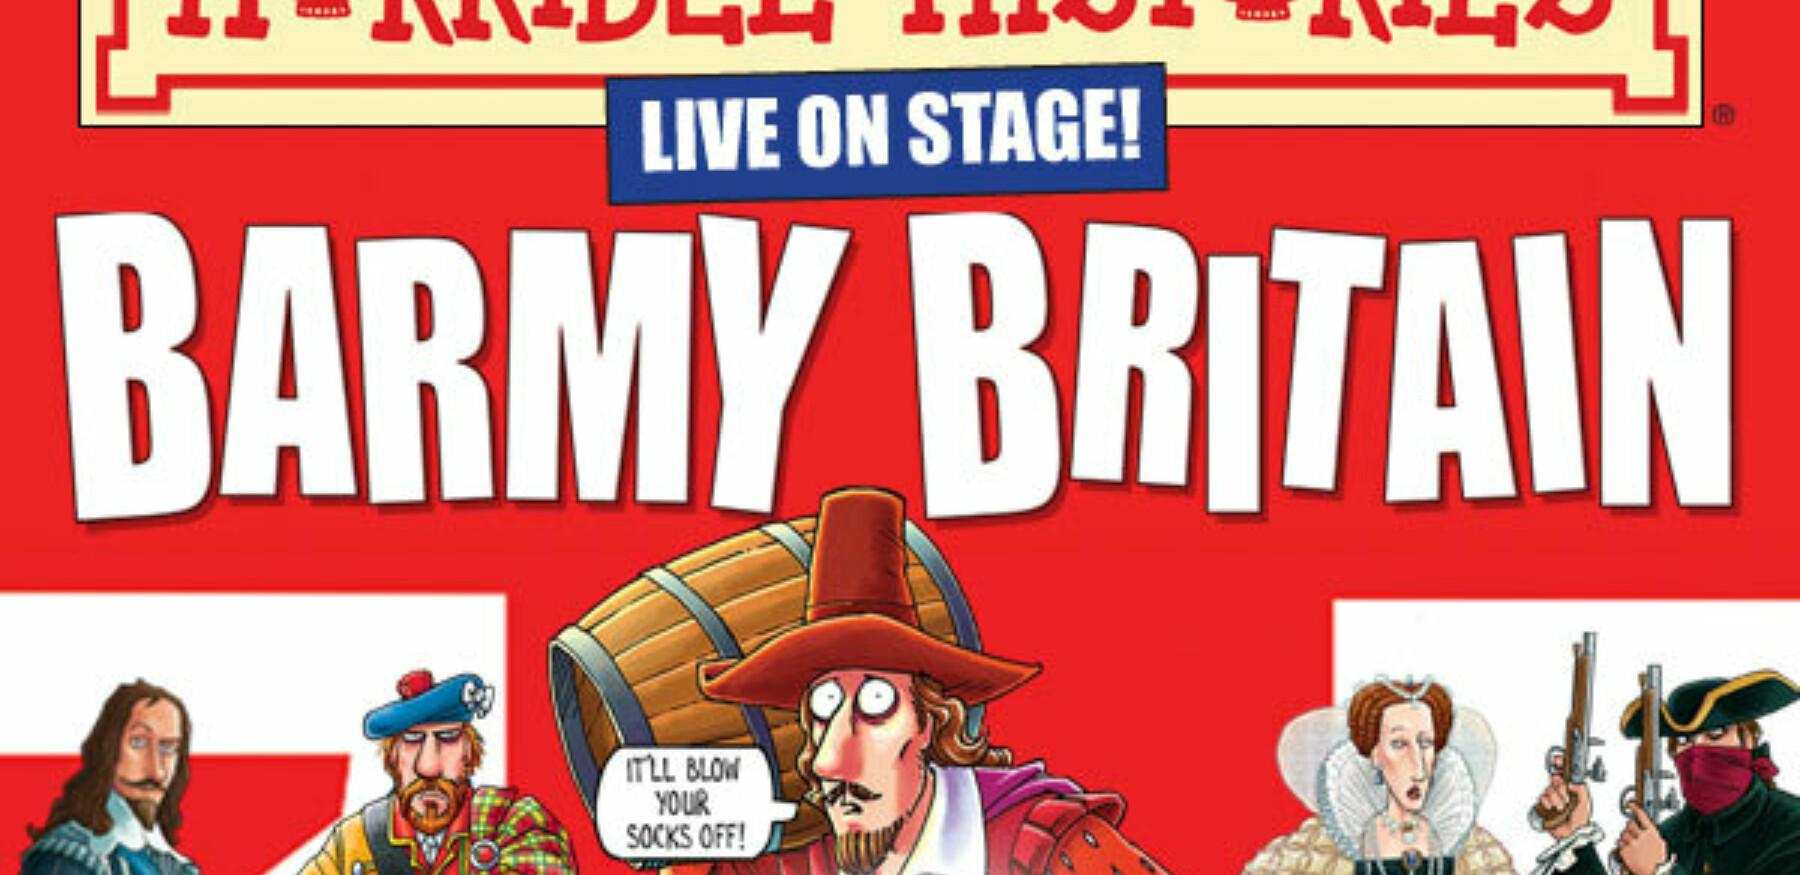 Barmy Britain 600x450px